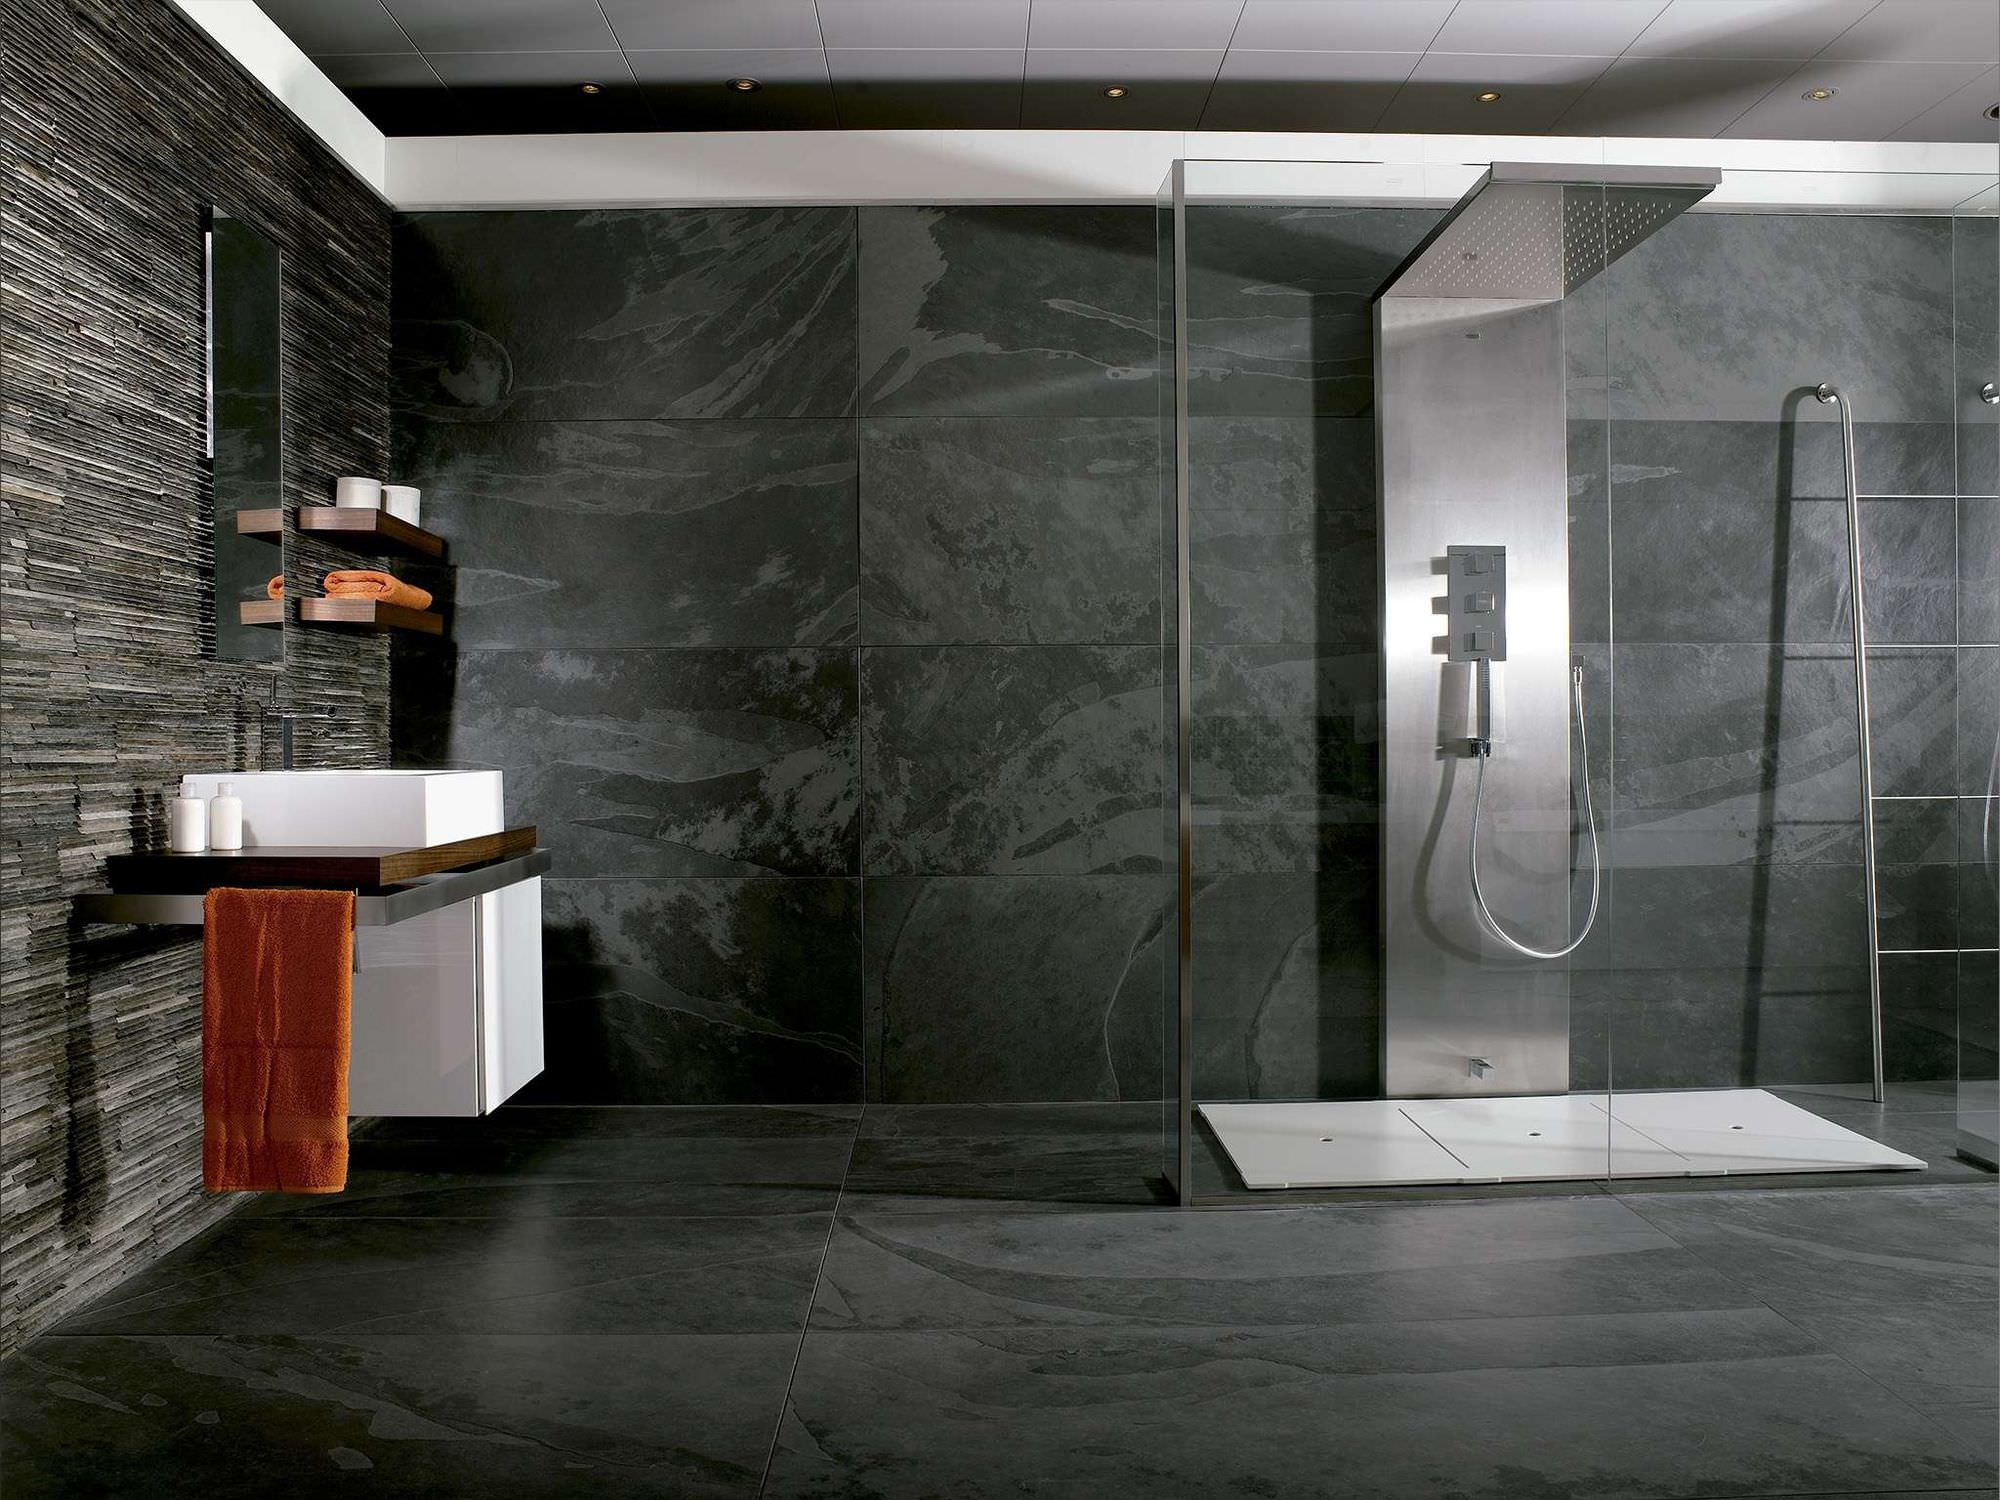 Innenraum Fliesen Fur Badezimmer Wand Schiefer Patagonia